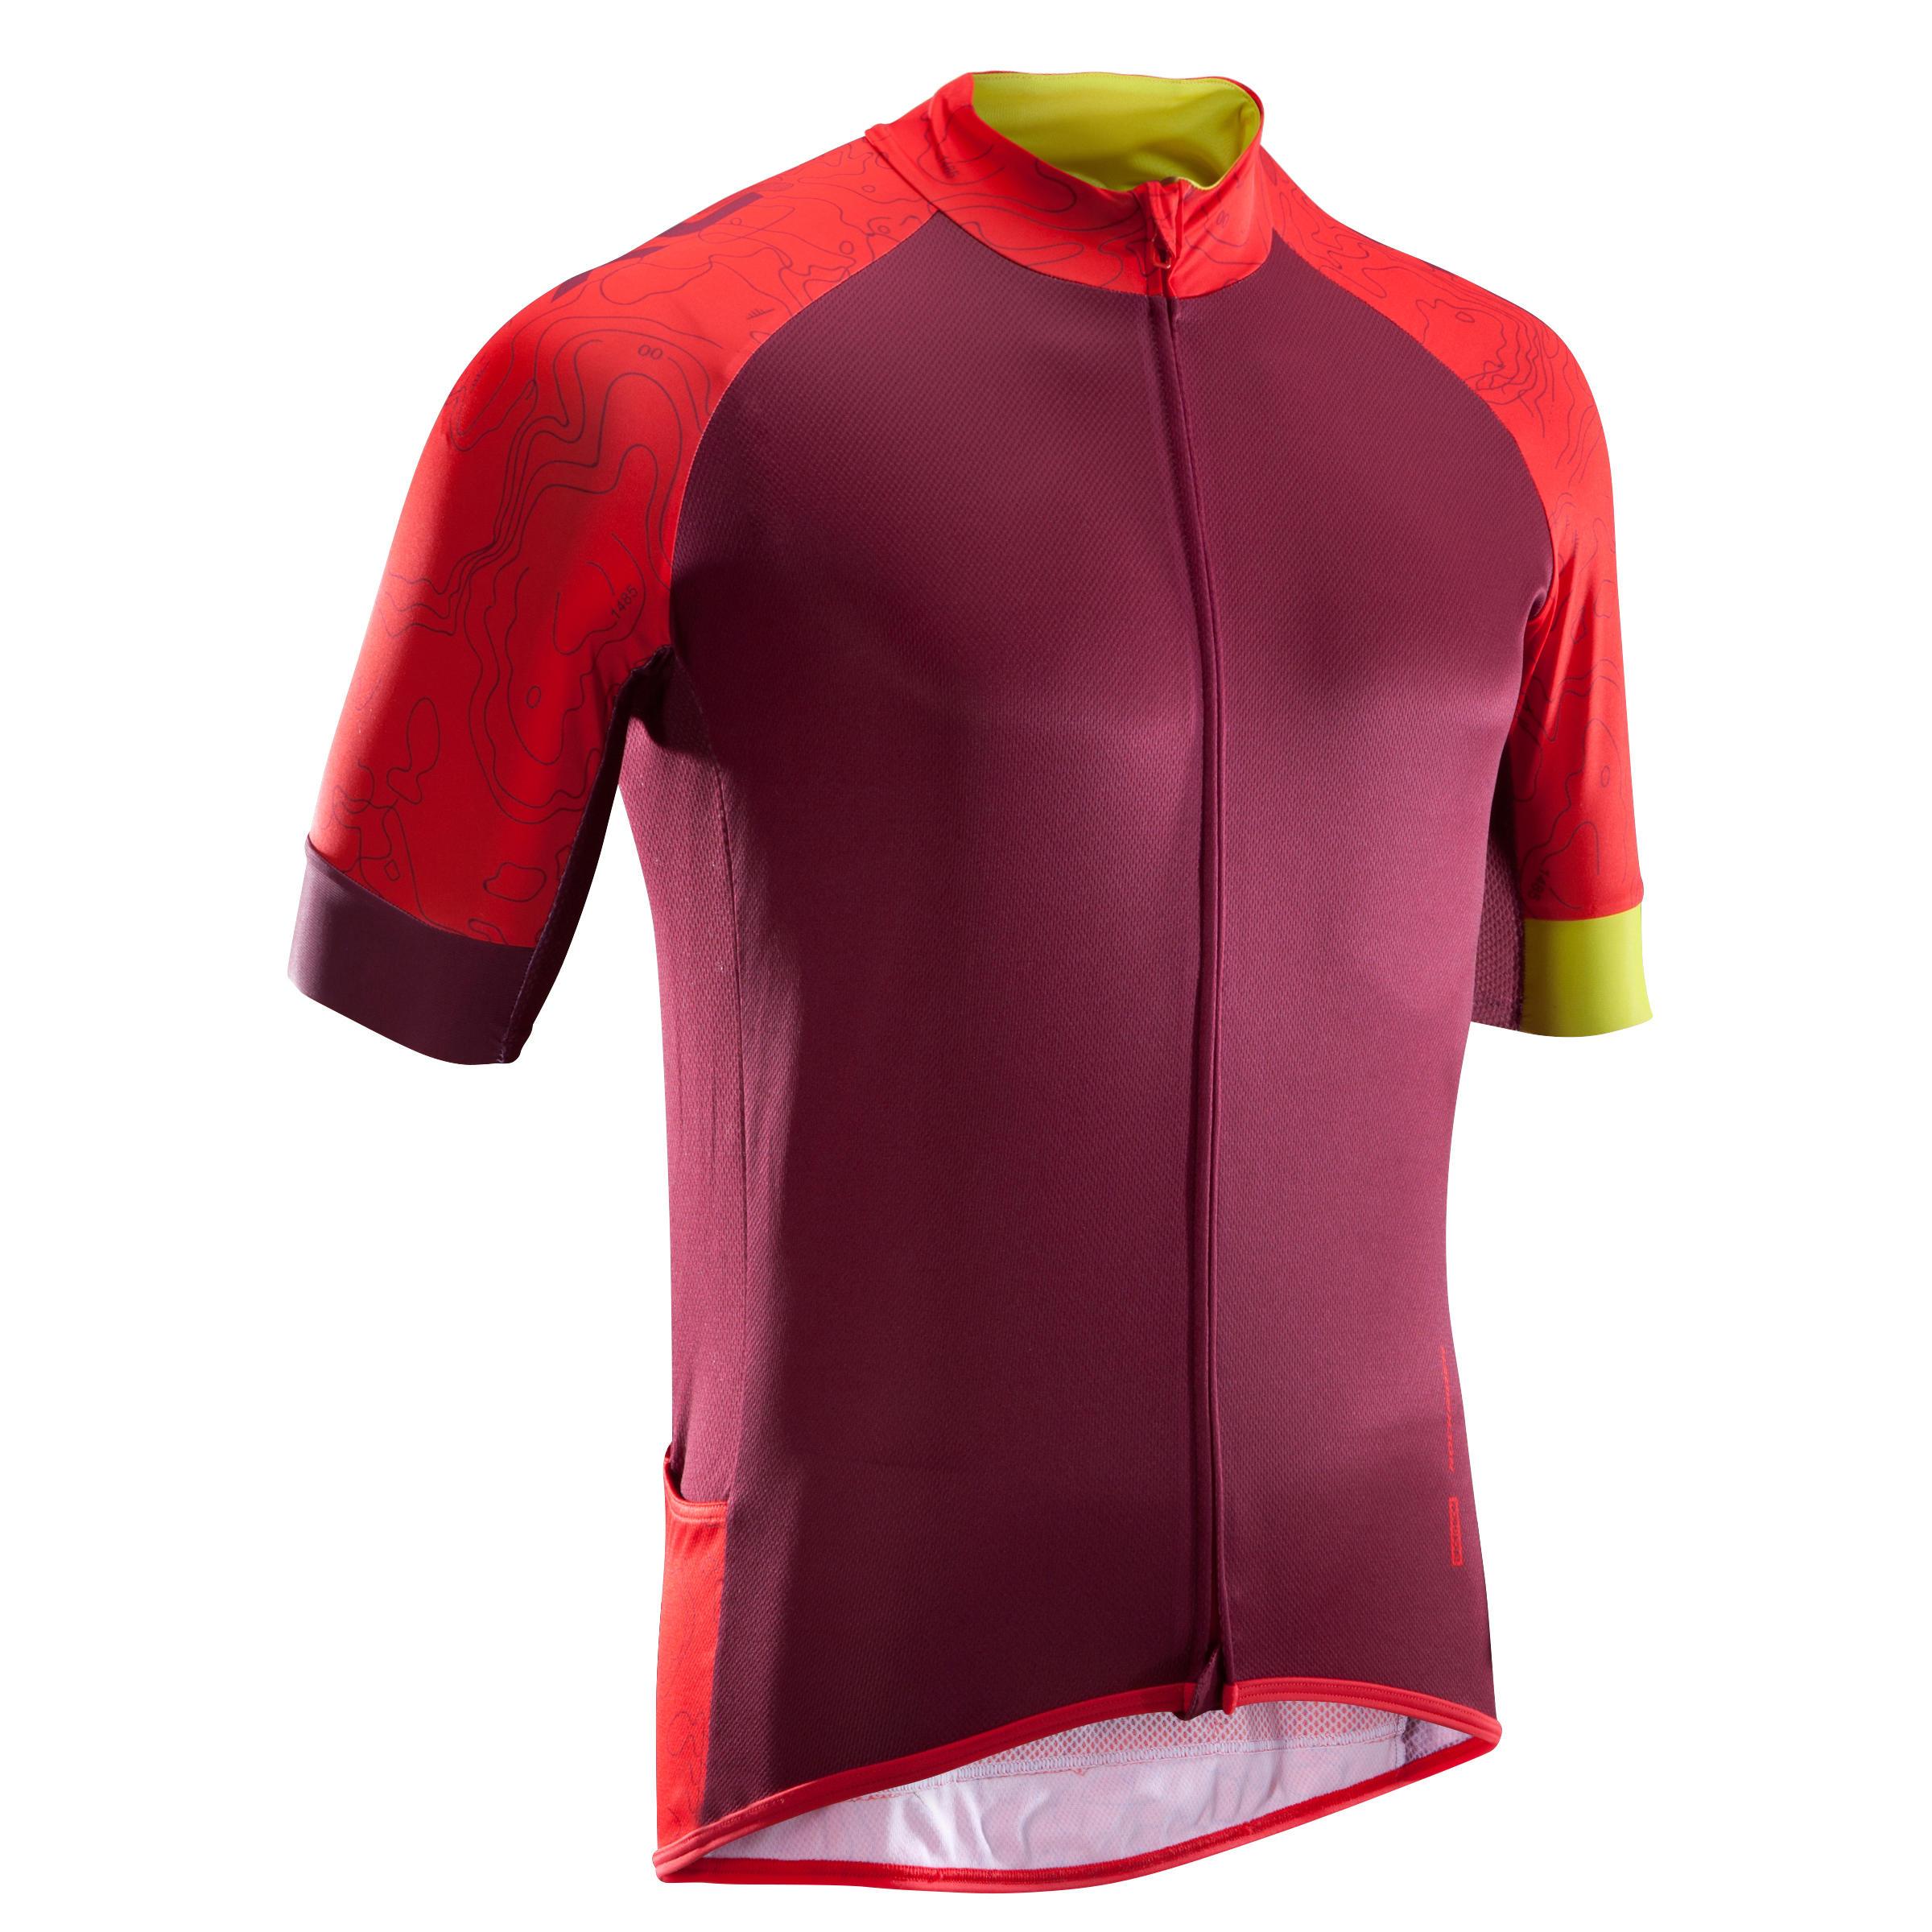 Fahrradtrikot XC 100 kurzarm MTB weinrot | Sportbekleidung > Trikots > Fahrradtrikots | Rot - Gelb | Baumwolle | Rockrider